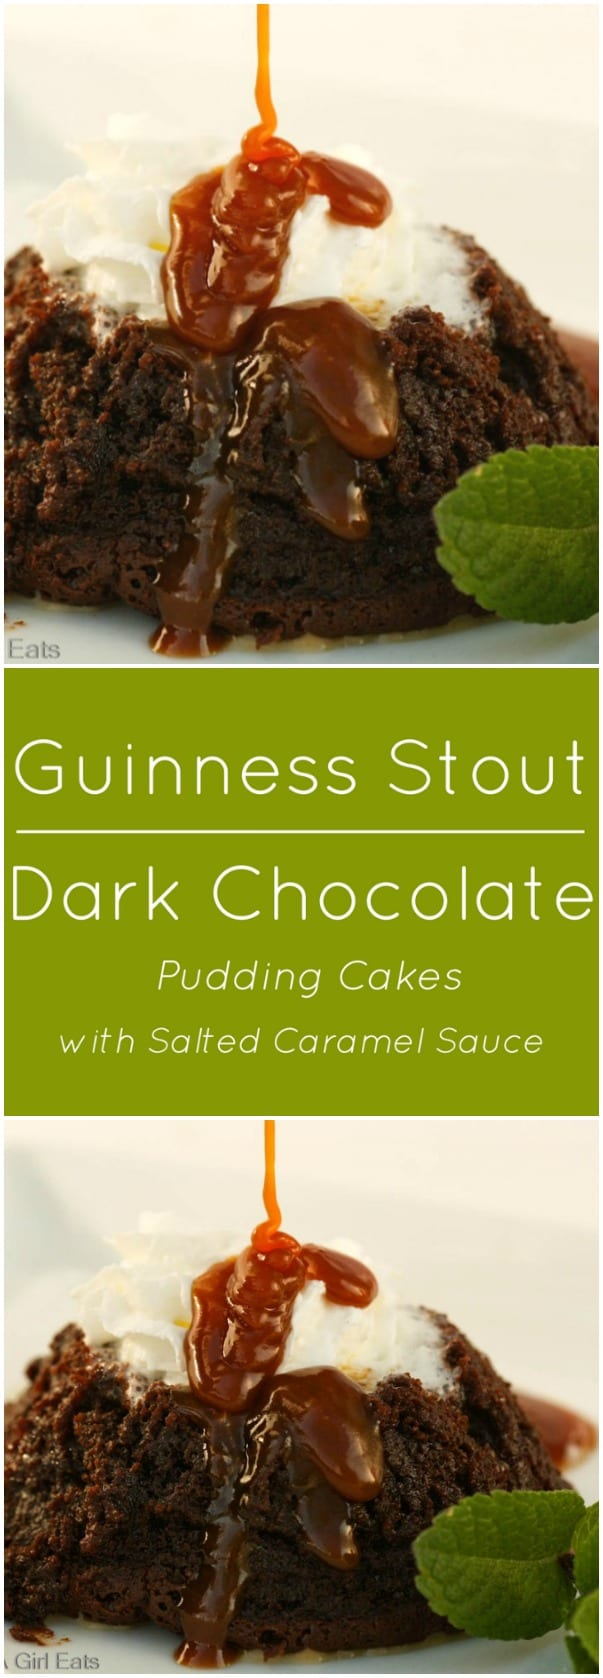 Flourless Guinness Stout dark chocolate pudding cakes with salted caramel sauce.